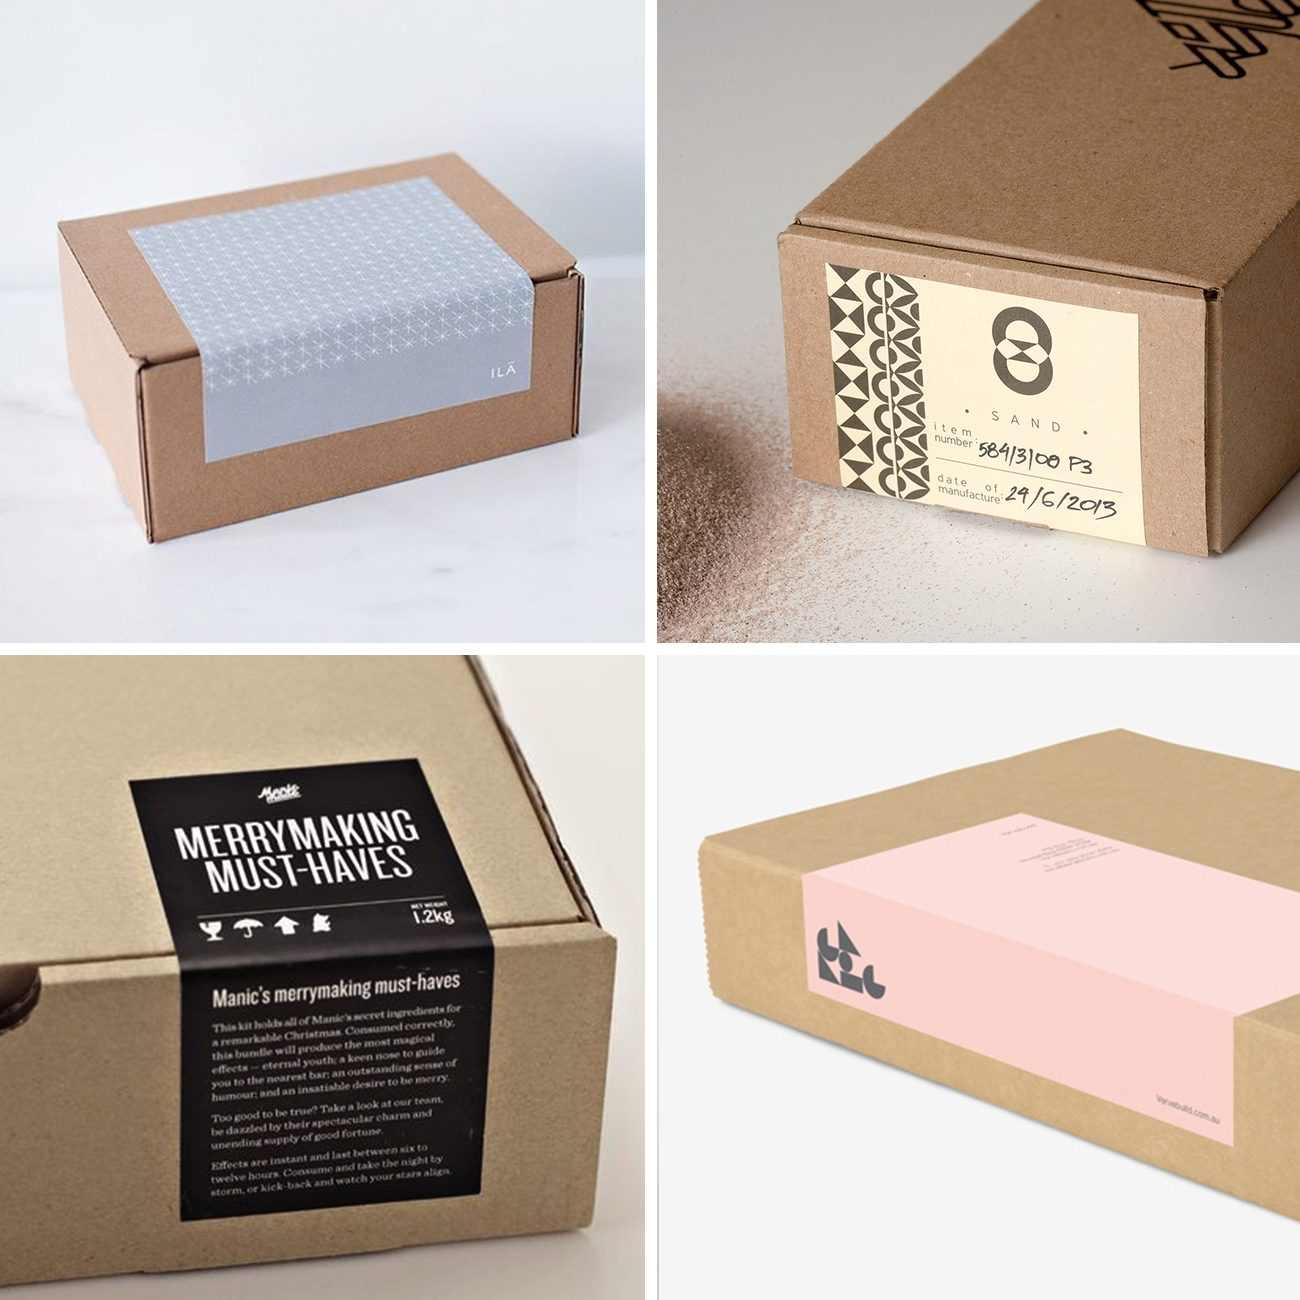 Photos via: Anagrama; Ila; Marios Georntamilis, Nikos Athanasopoulos, and Konstantina Gorgogianni, —, — 90 Ideas to Spruce Up Your Holiday Packaging Design